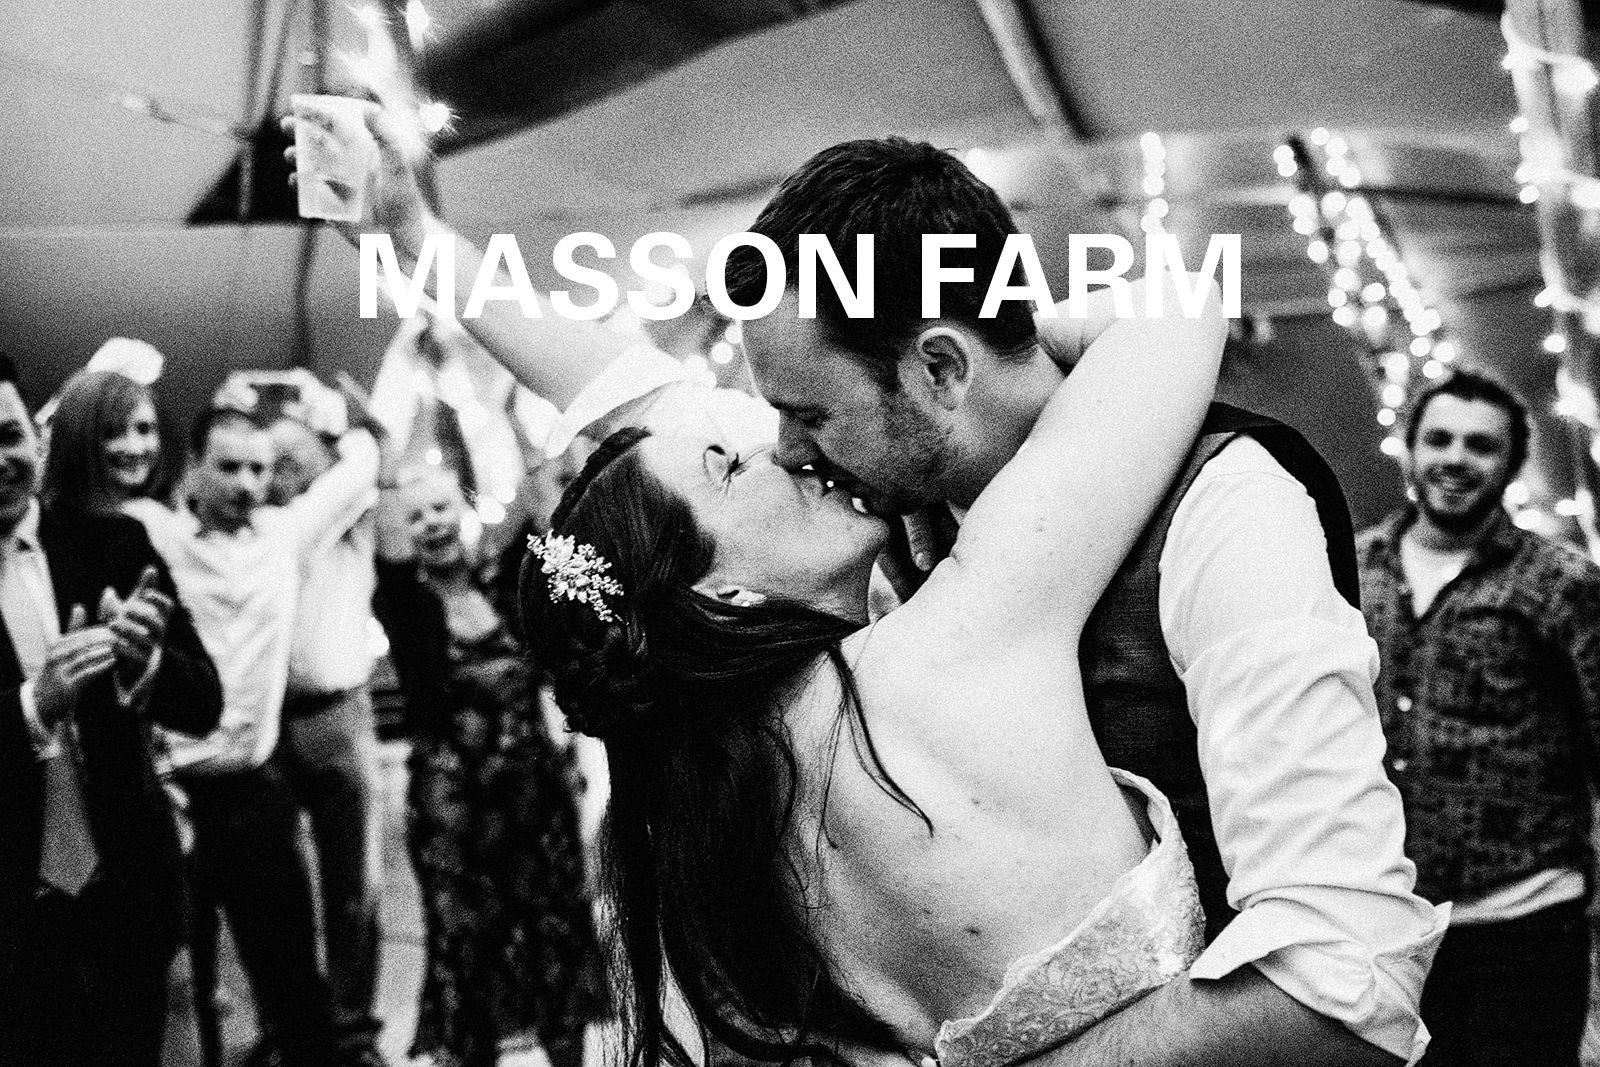 Masson Farm Weddings